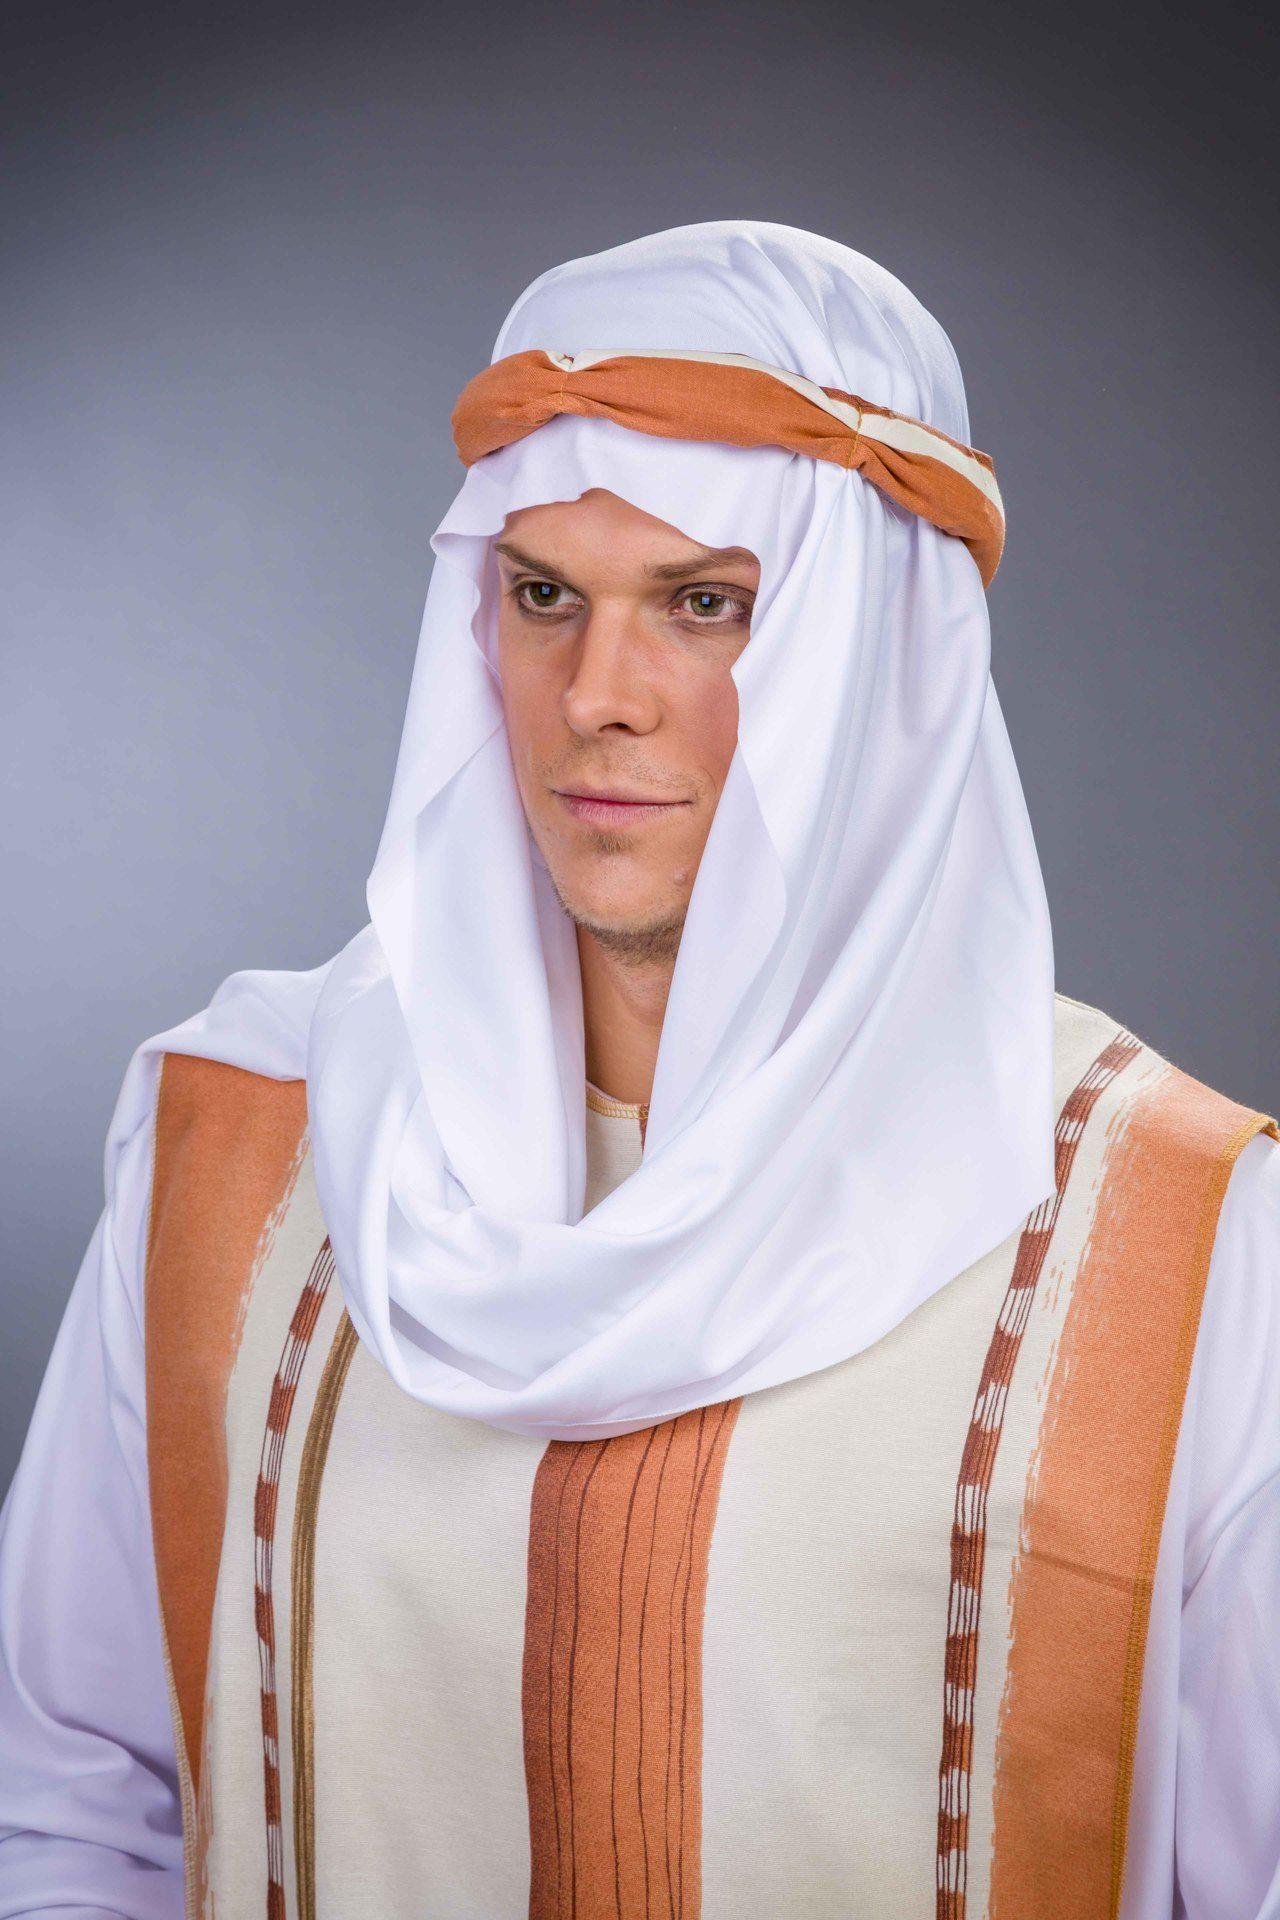 Araberfürst